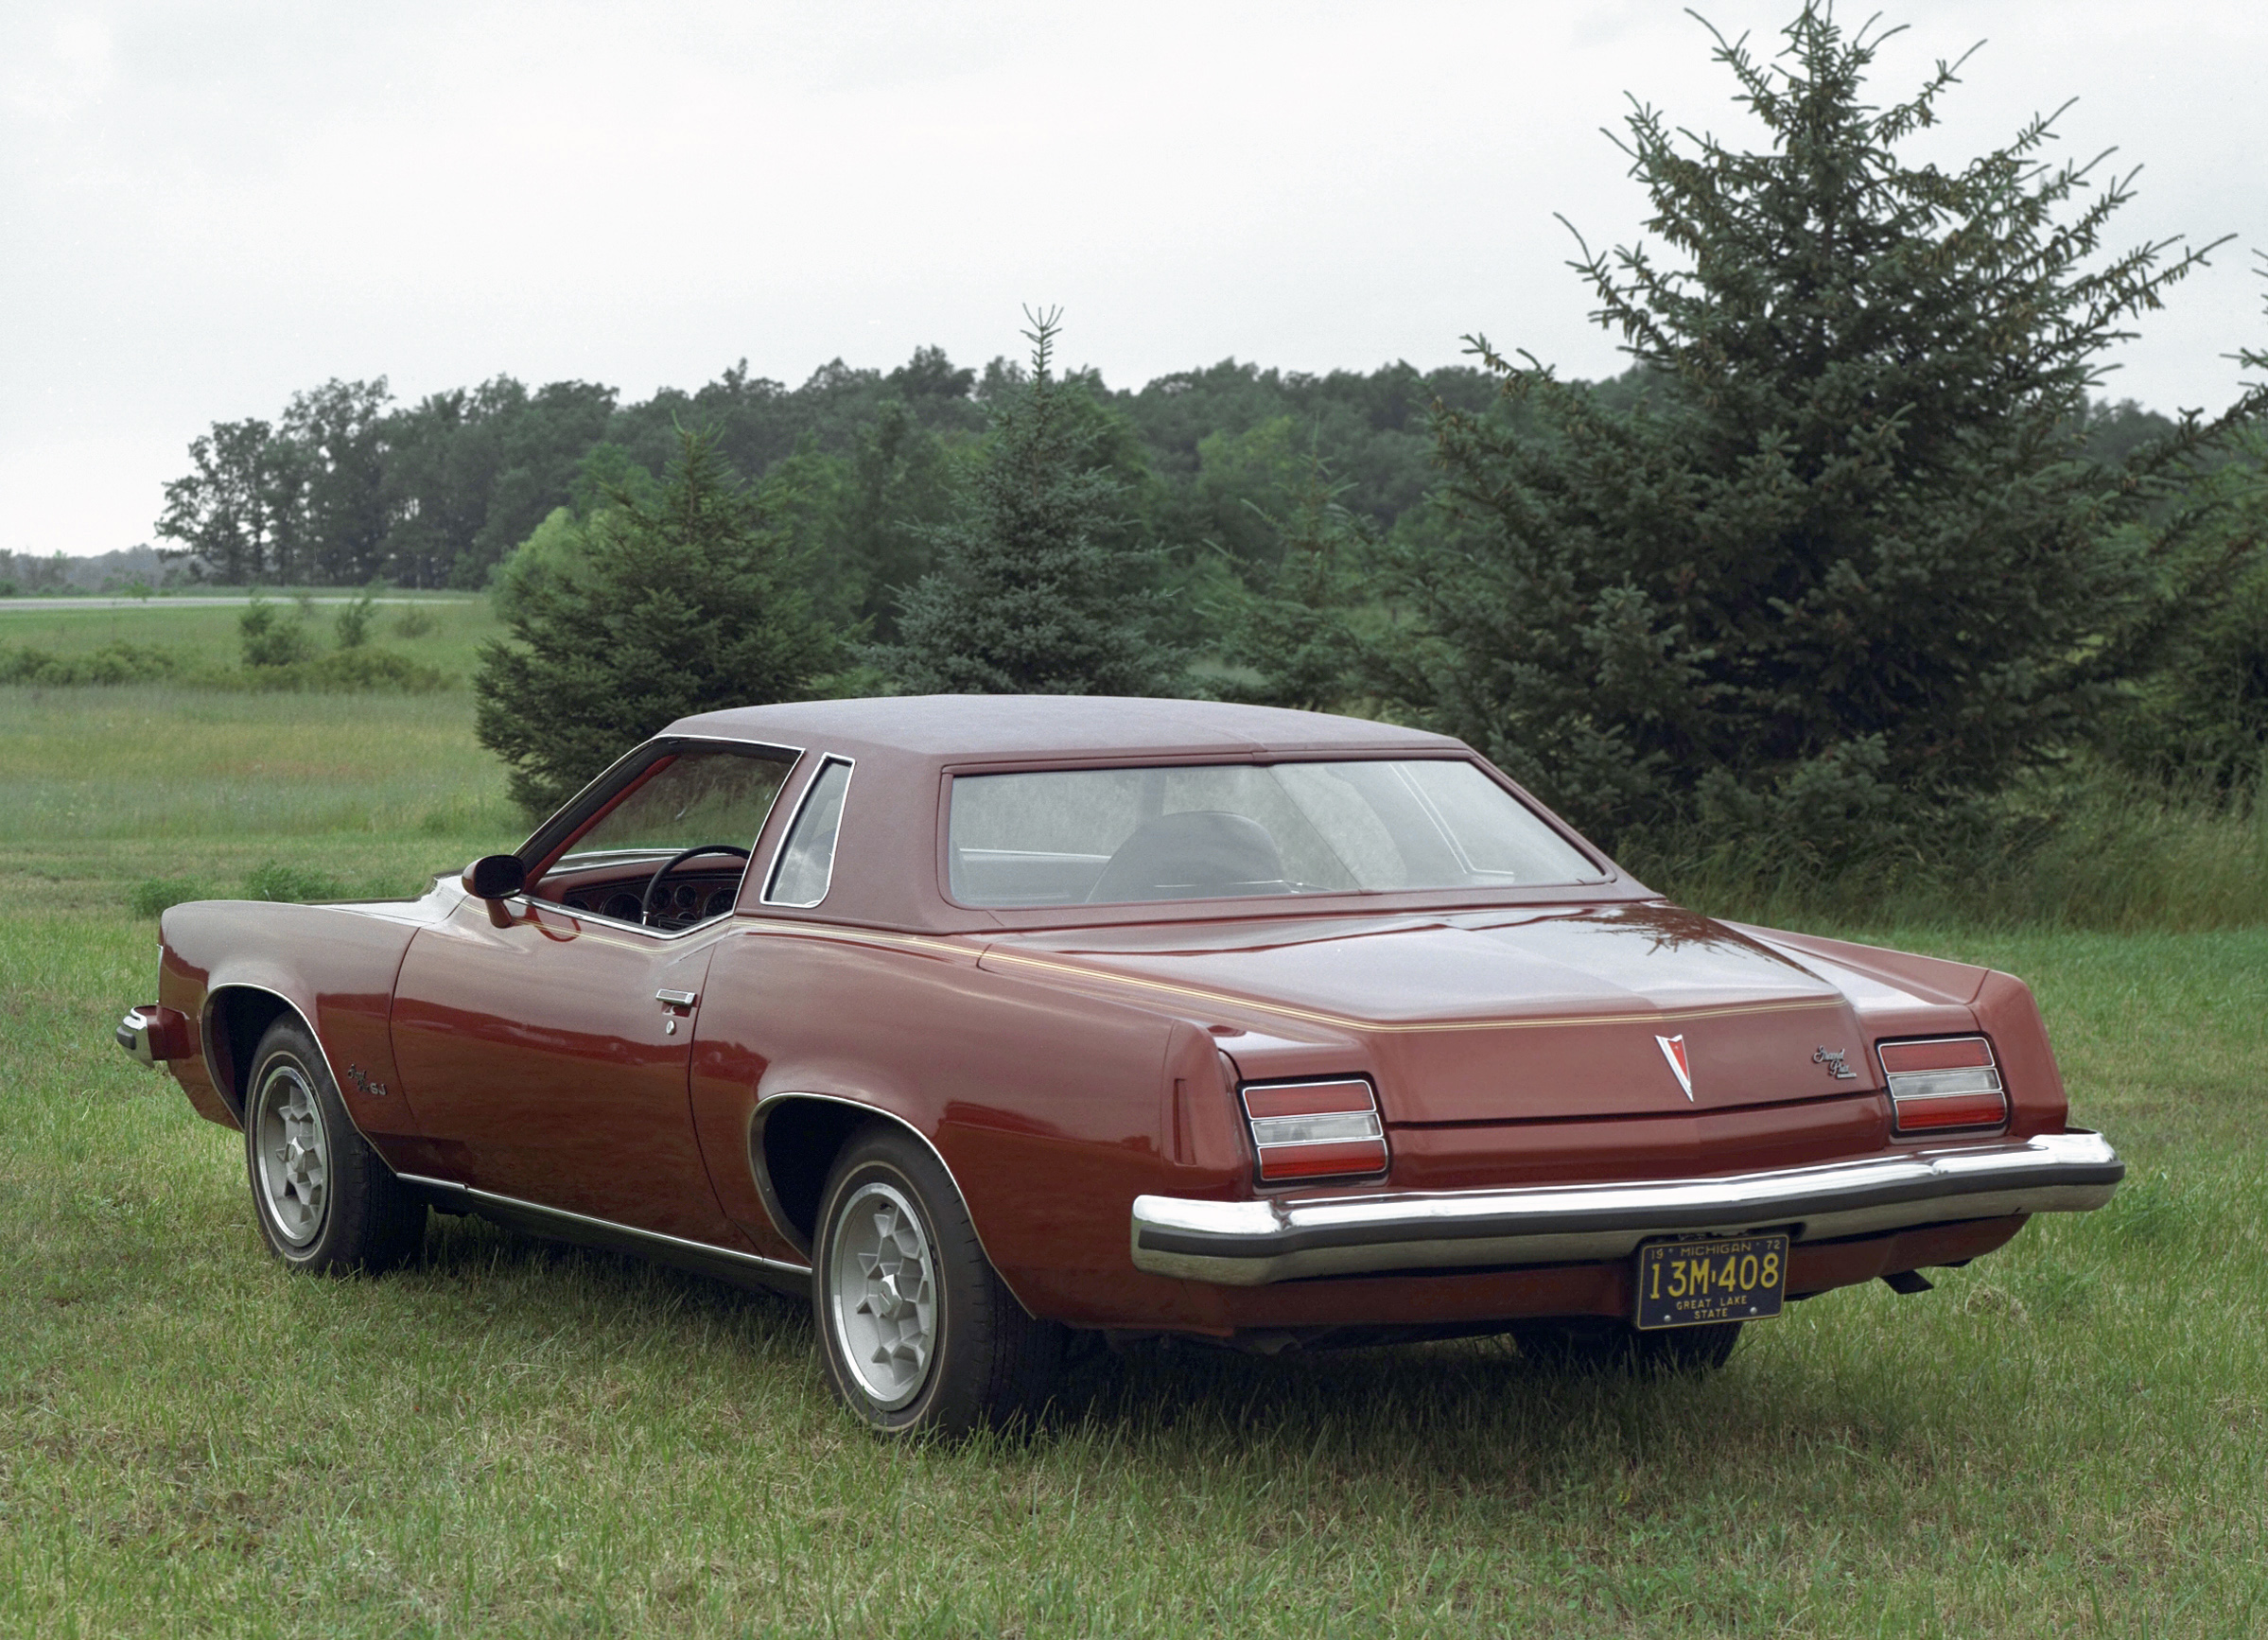 1973 pontiac grand prix rear